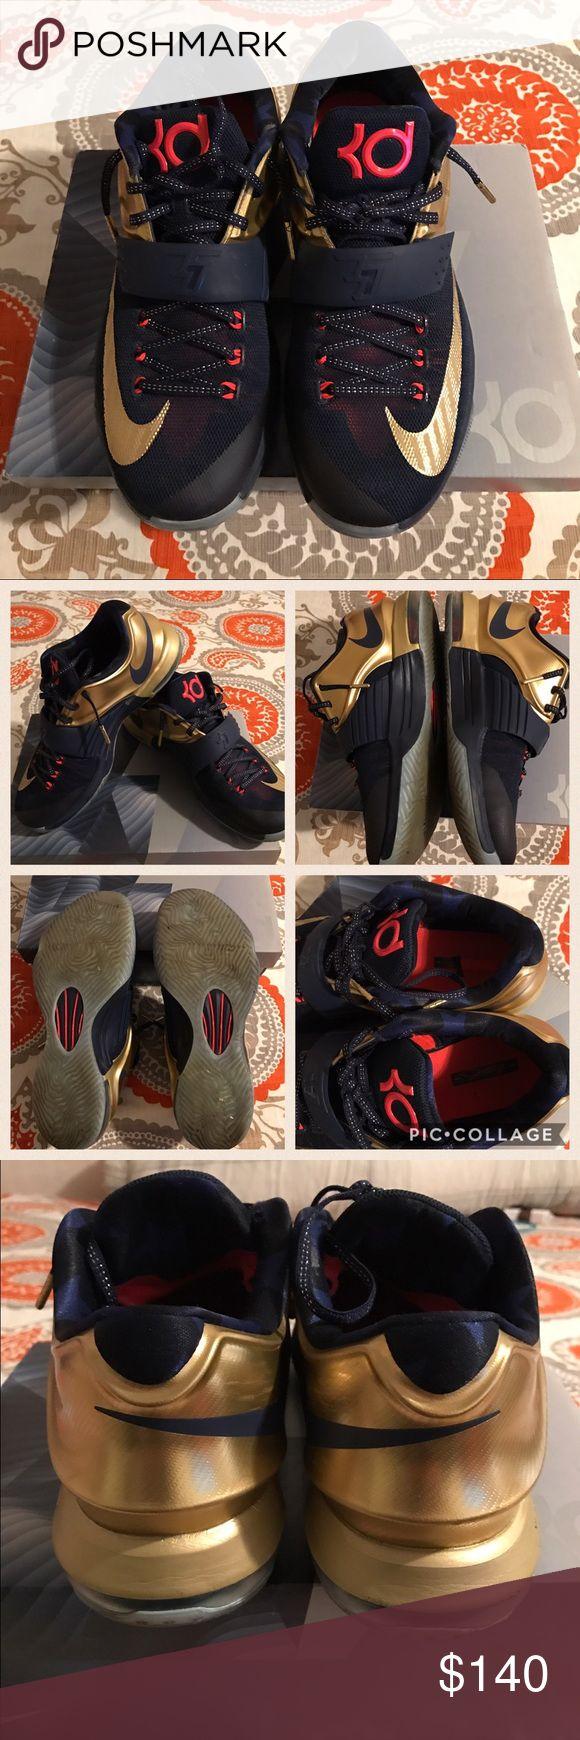 "KD 7 PRM ""GOLD MEDAL"" Excellent condition Men's size 9.5 ... KD 7 PRM ""GOLD MEDAL"" Nike Shoes Sneakers"